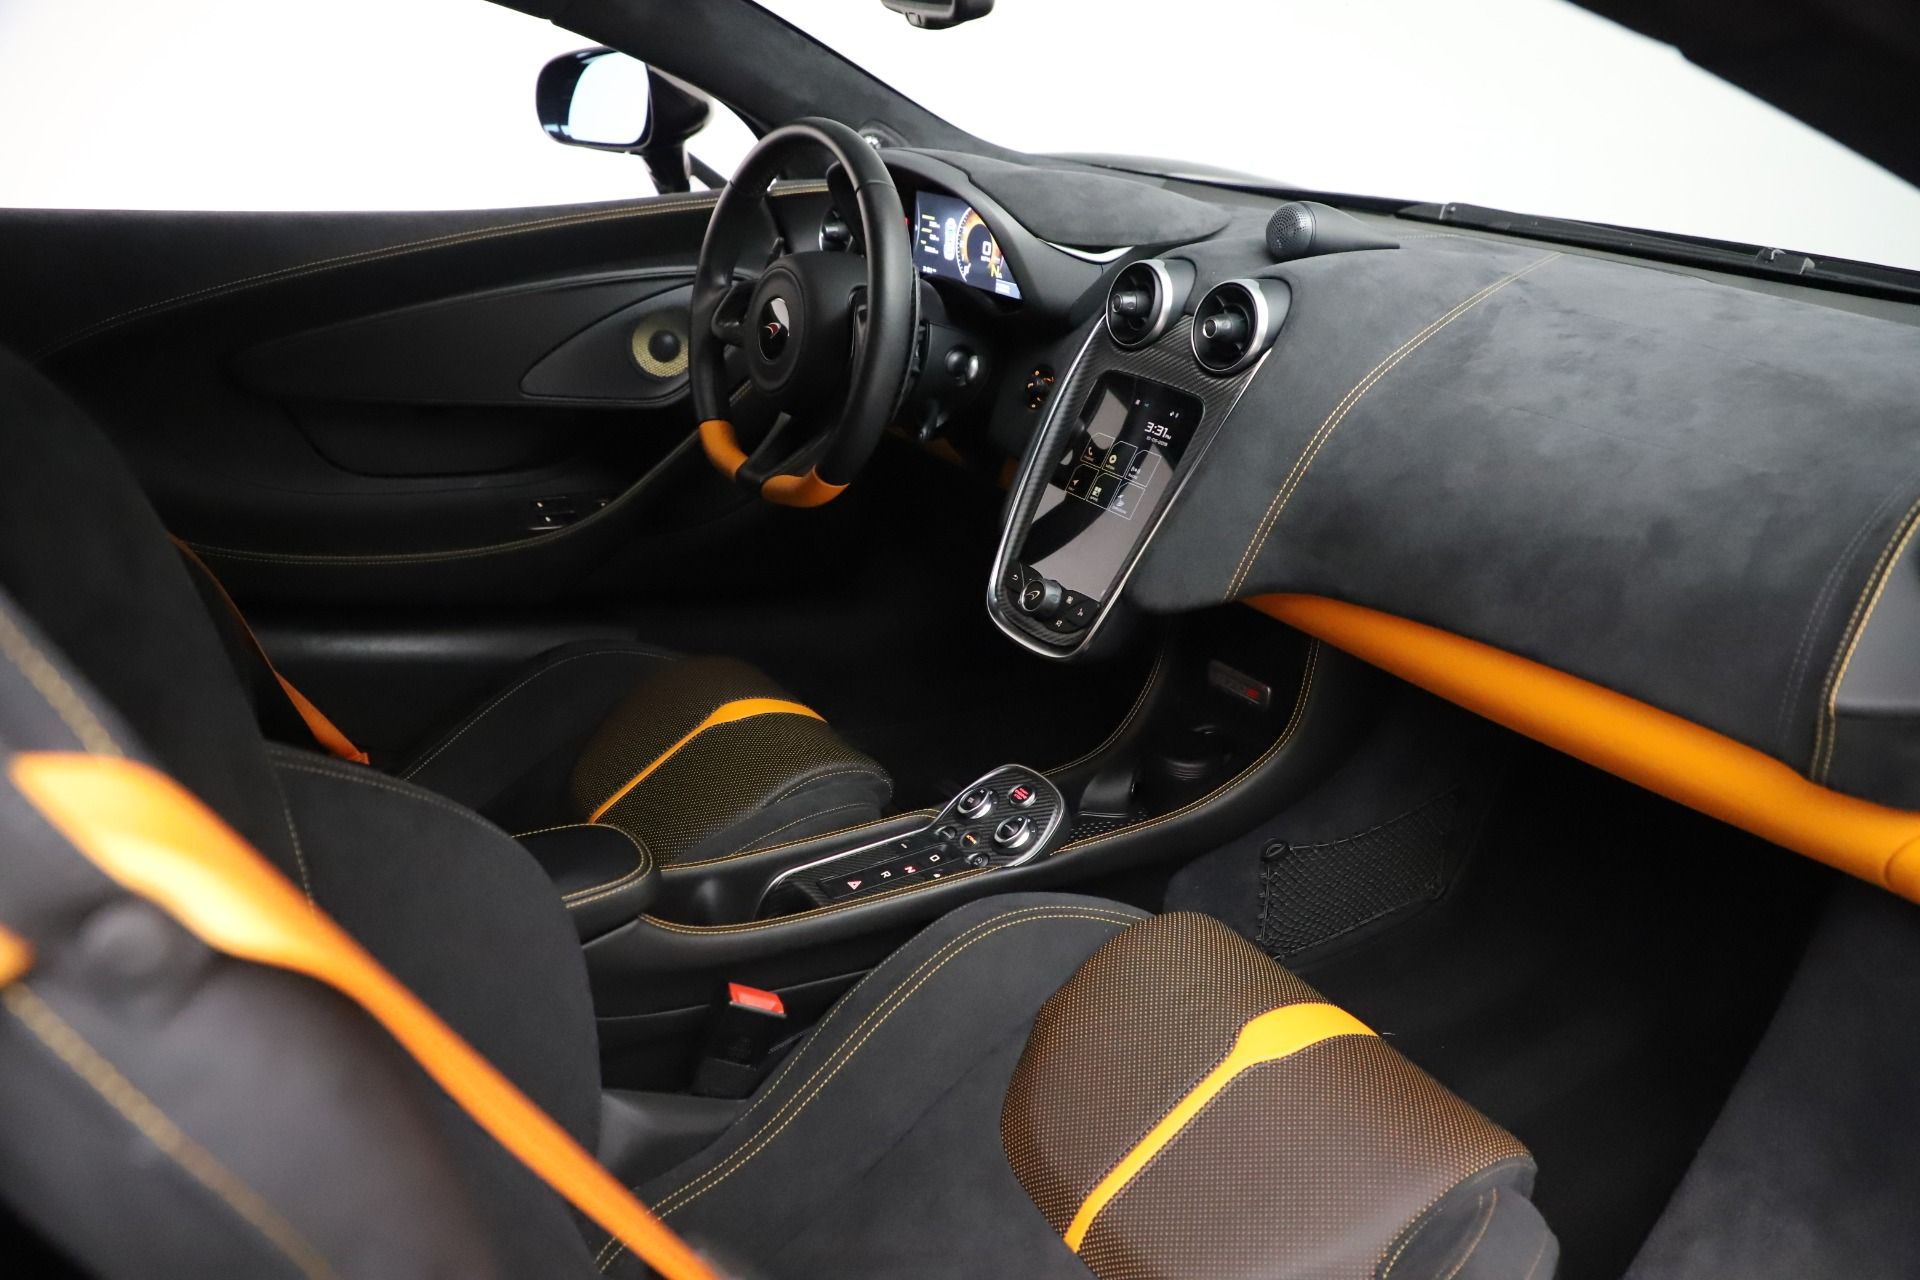 Used 2017 McLaren 570S Coupe For Sale In Westport, CT 3503_p19